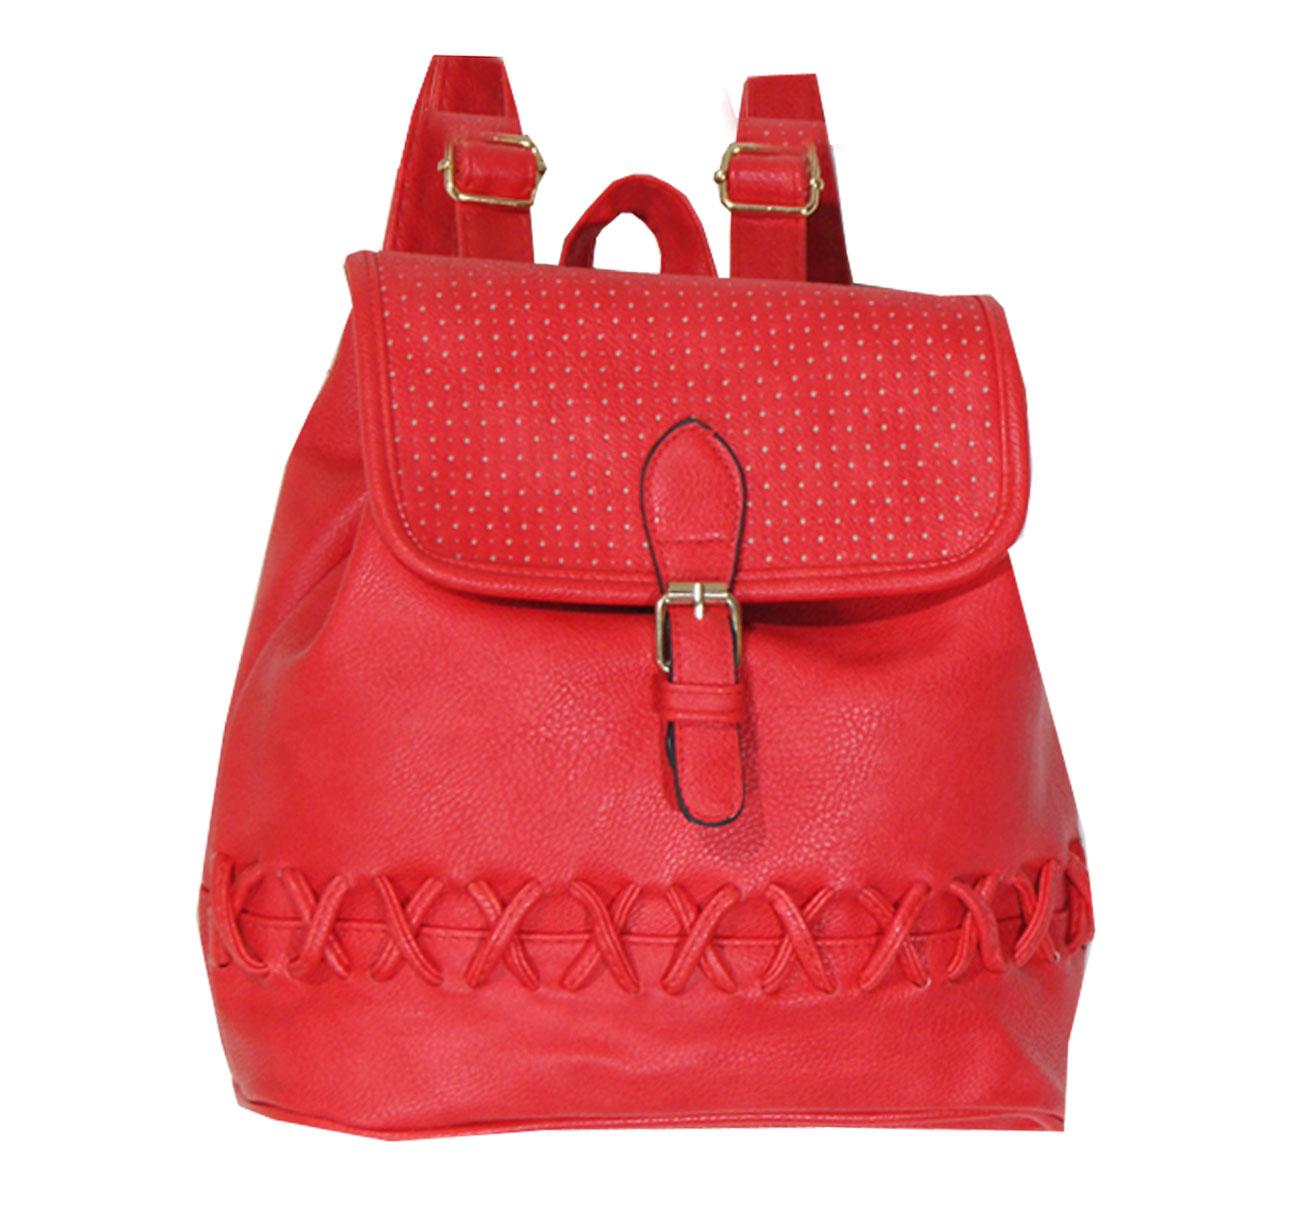 Backpack No 2007 - Κόκκινο (Borse Antonio 2007)